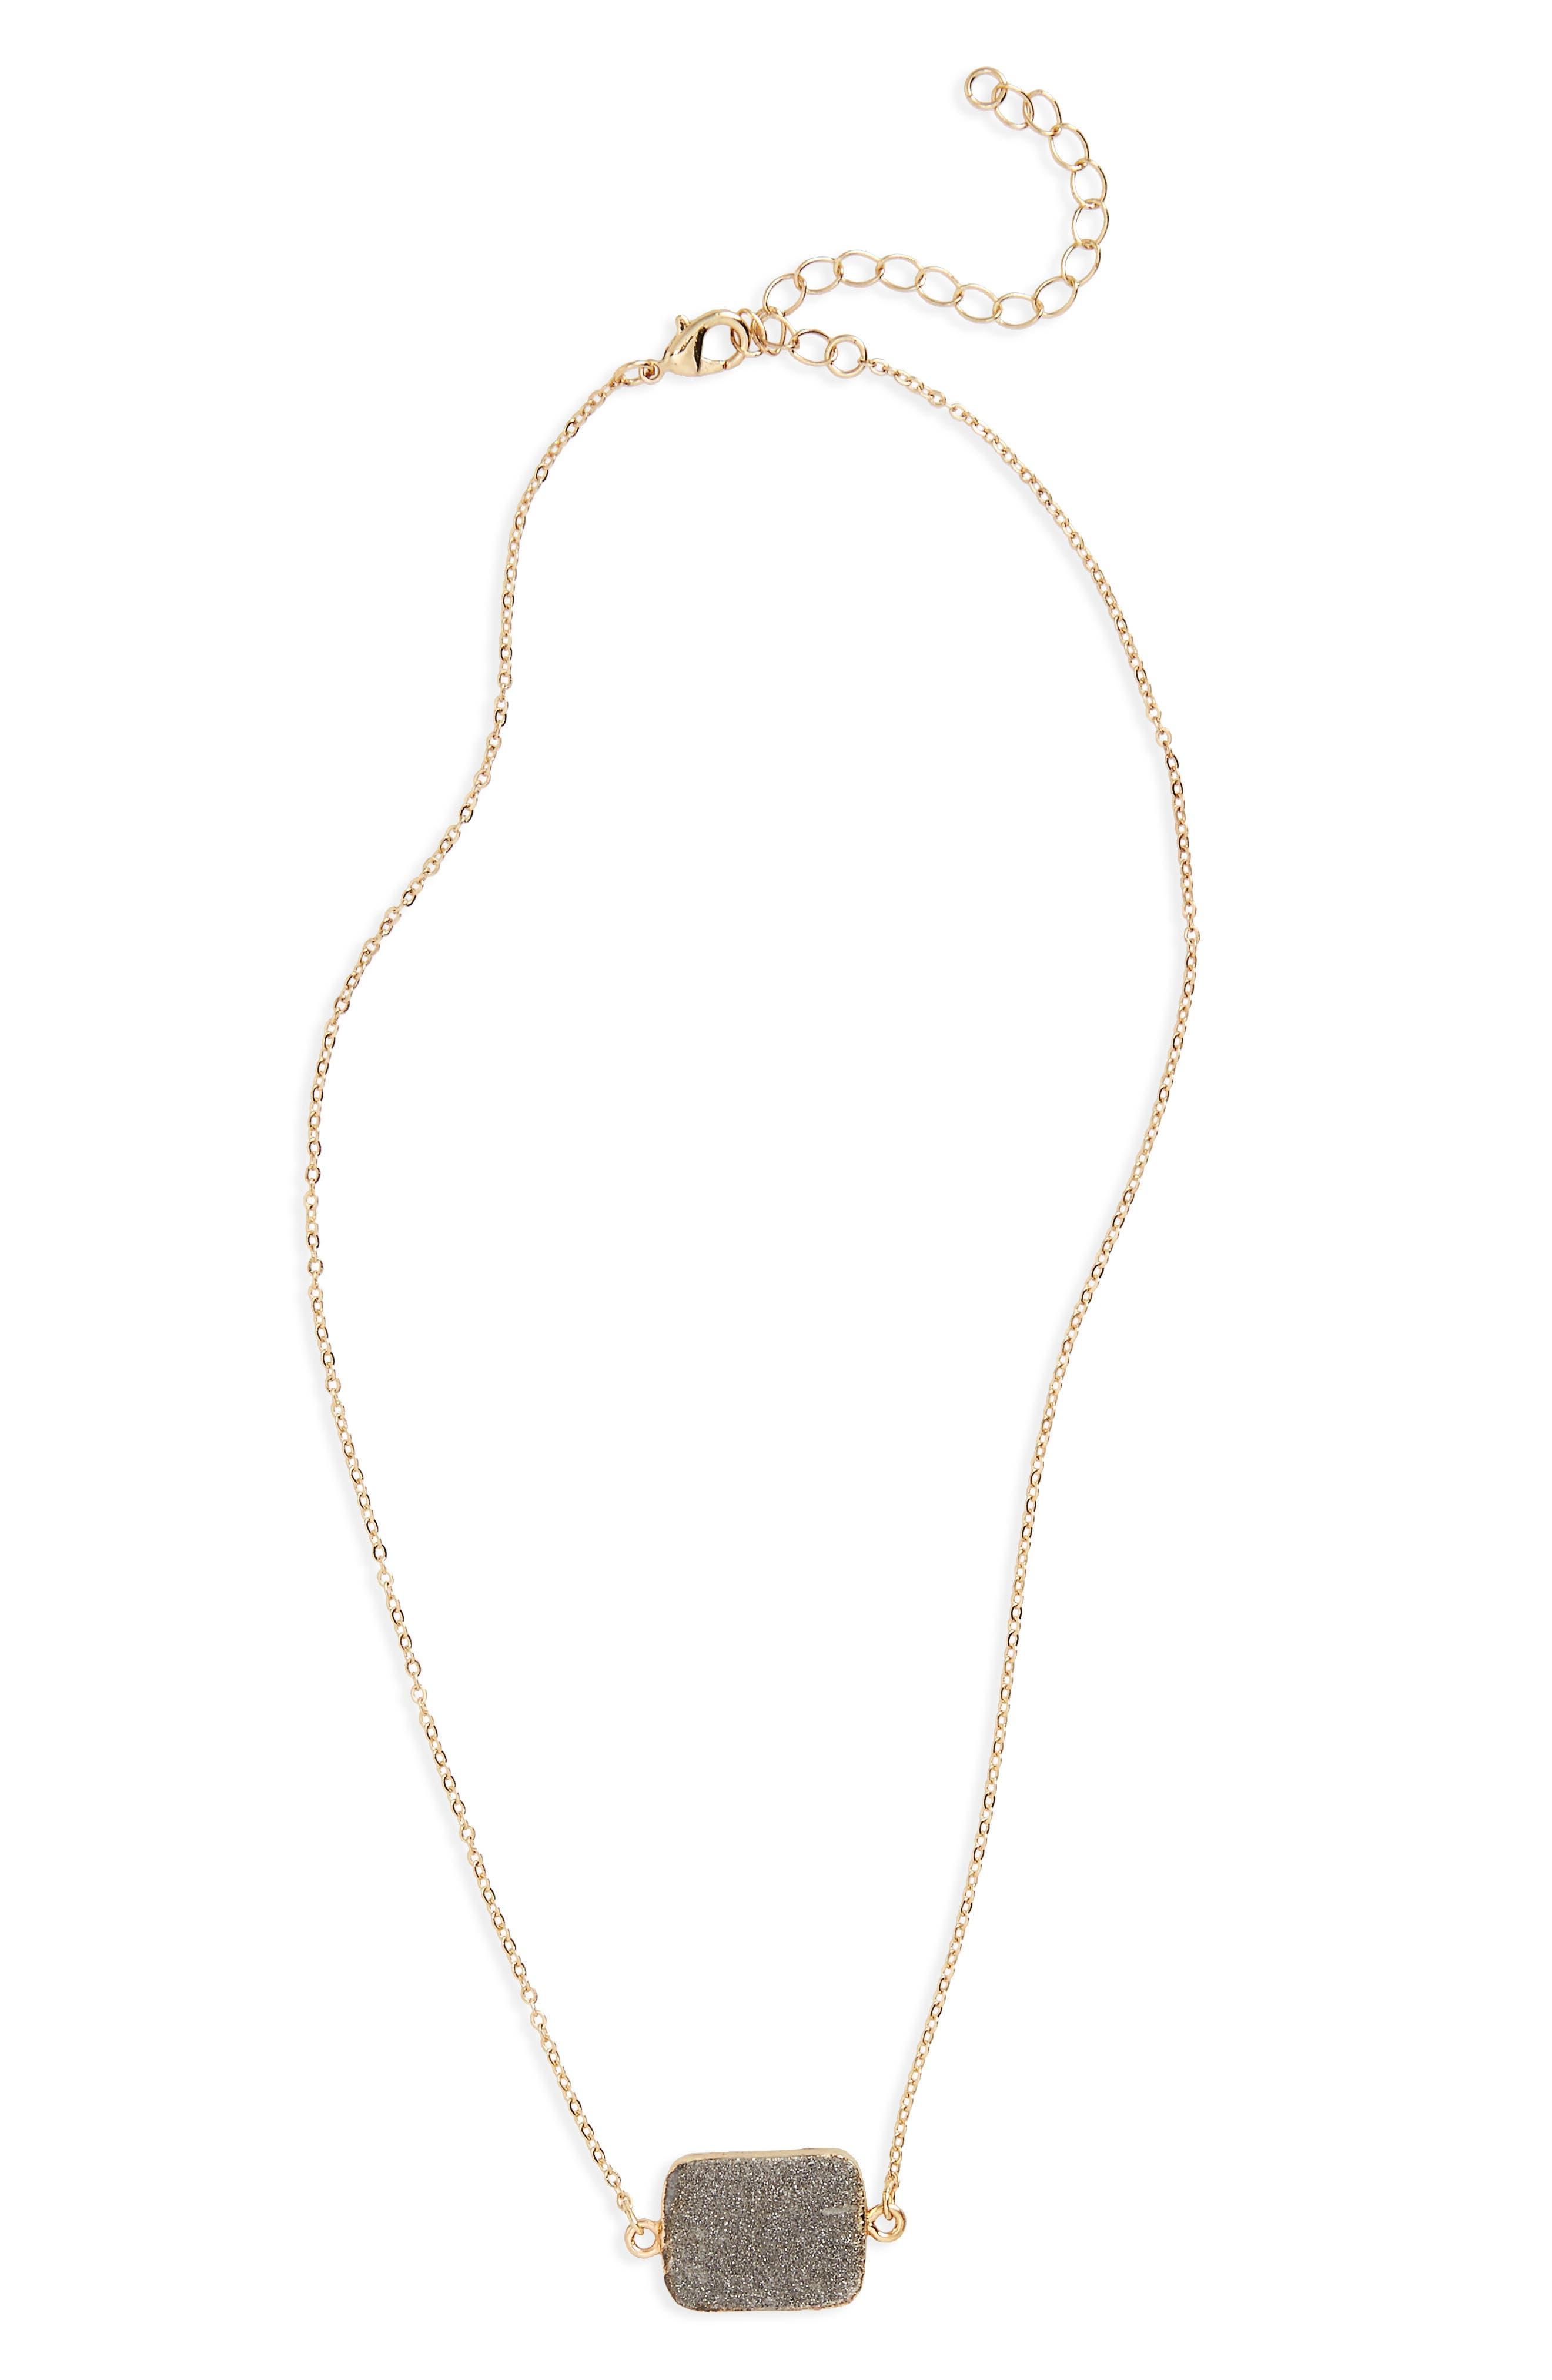 Alternate Image 1 Selected - Panacea Drusy Pendant Necklace